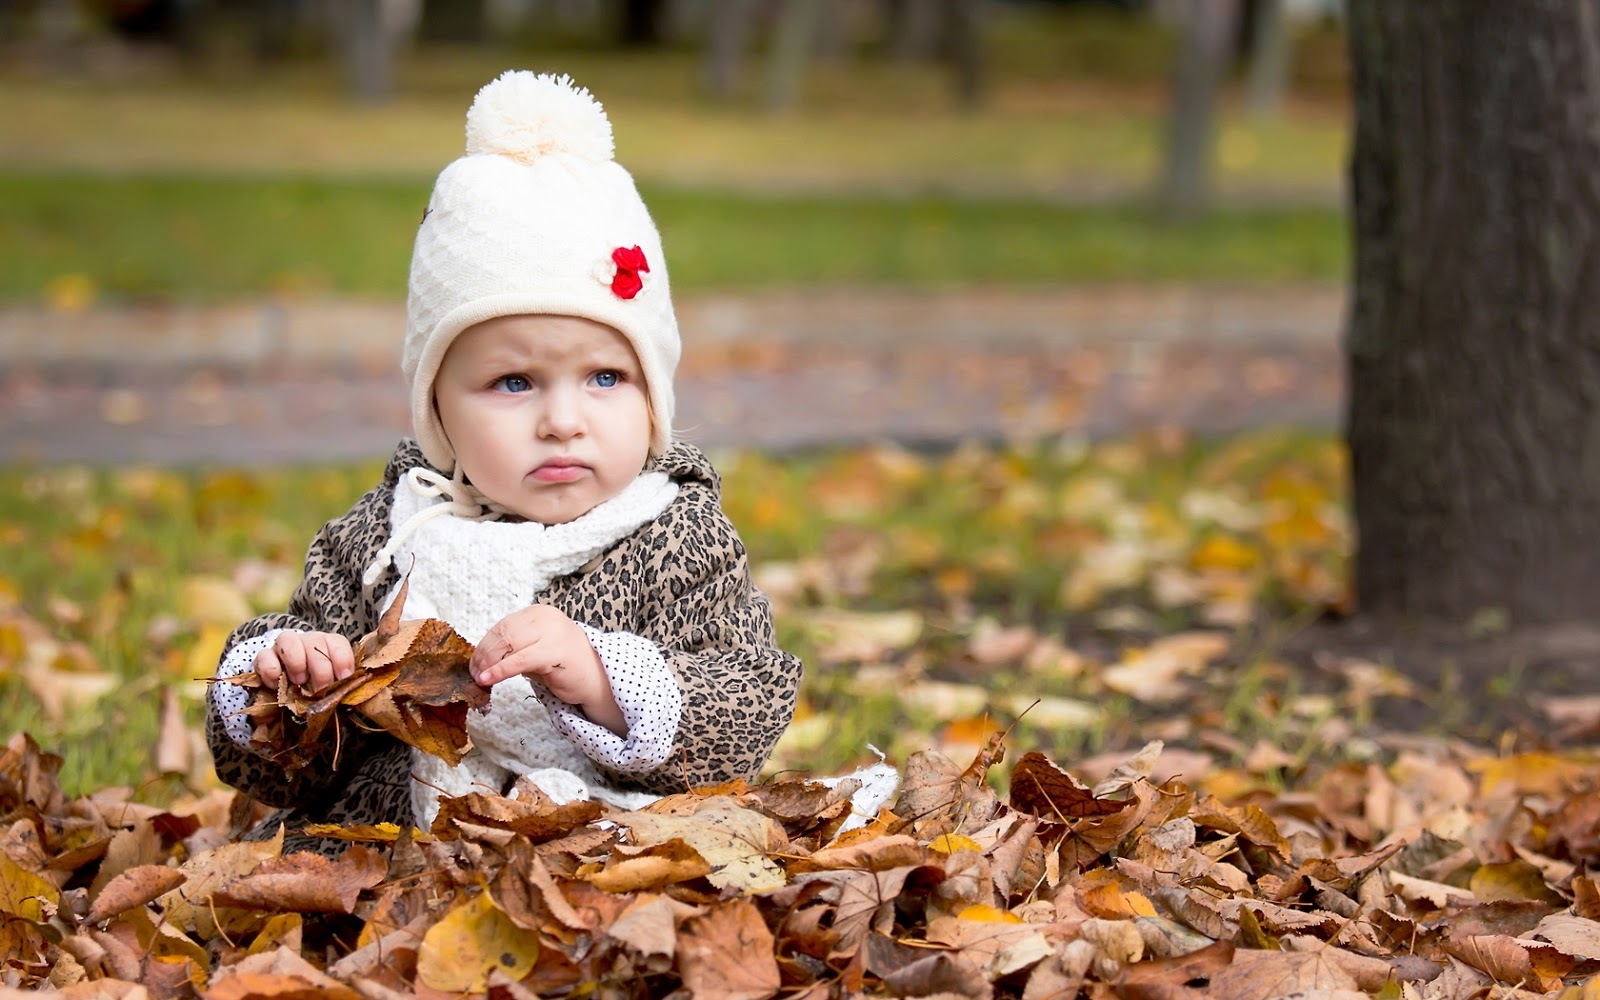 Cute Baby Hd Wallpapers Free Download Lite Mycket